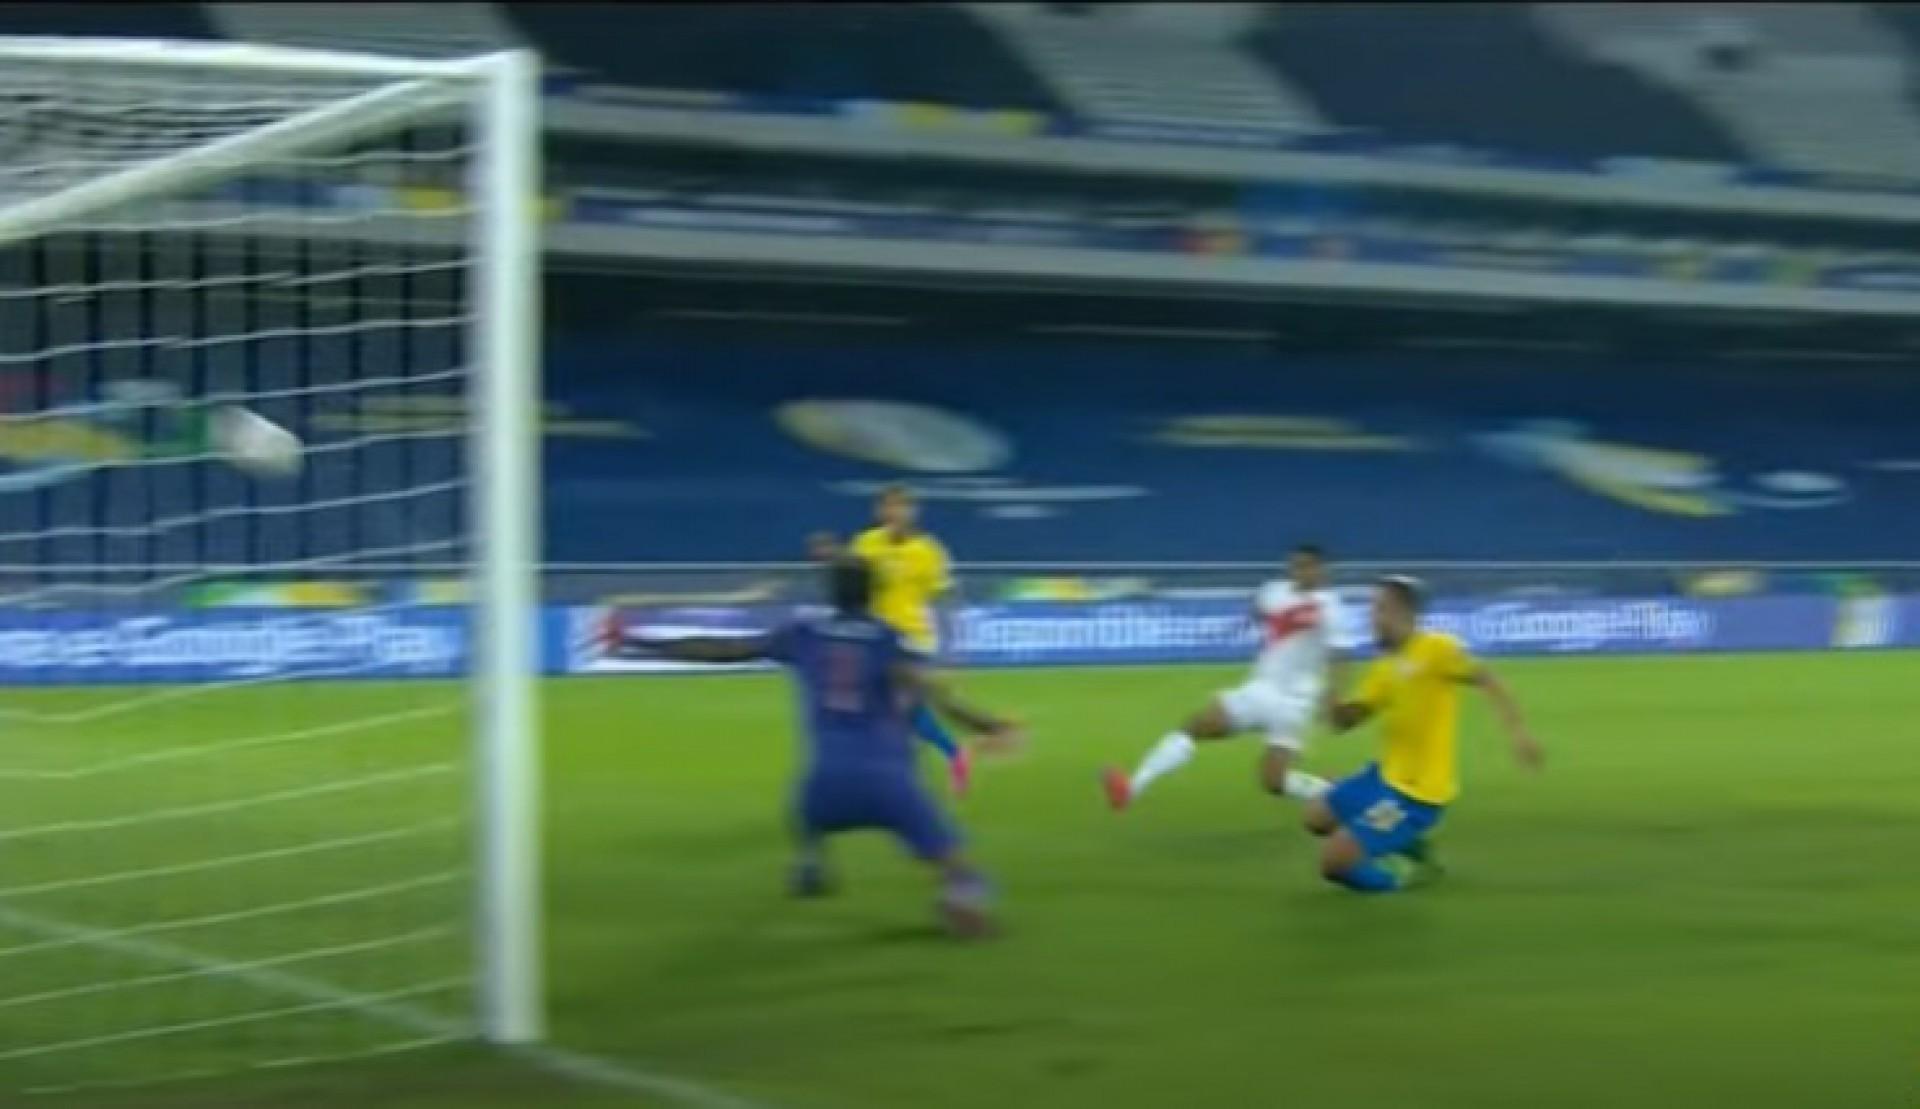 Brasil usa acréscimos para golear Peru